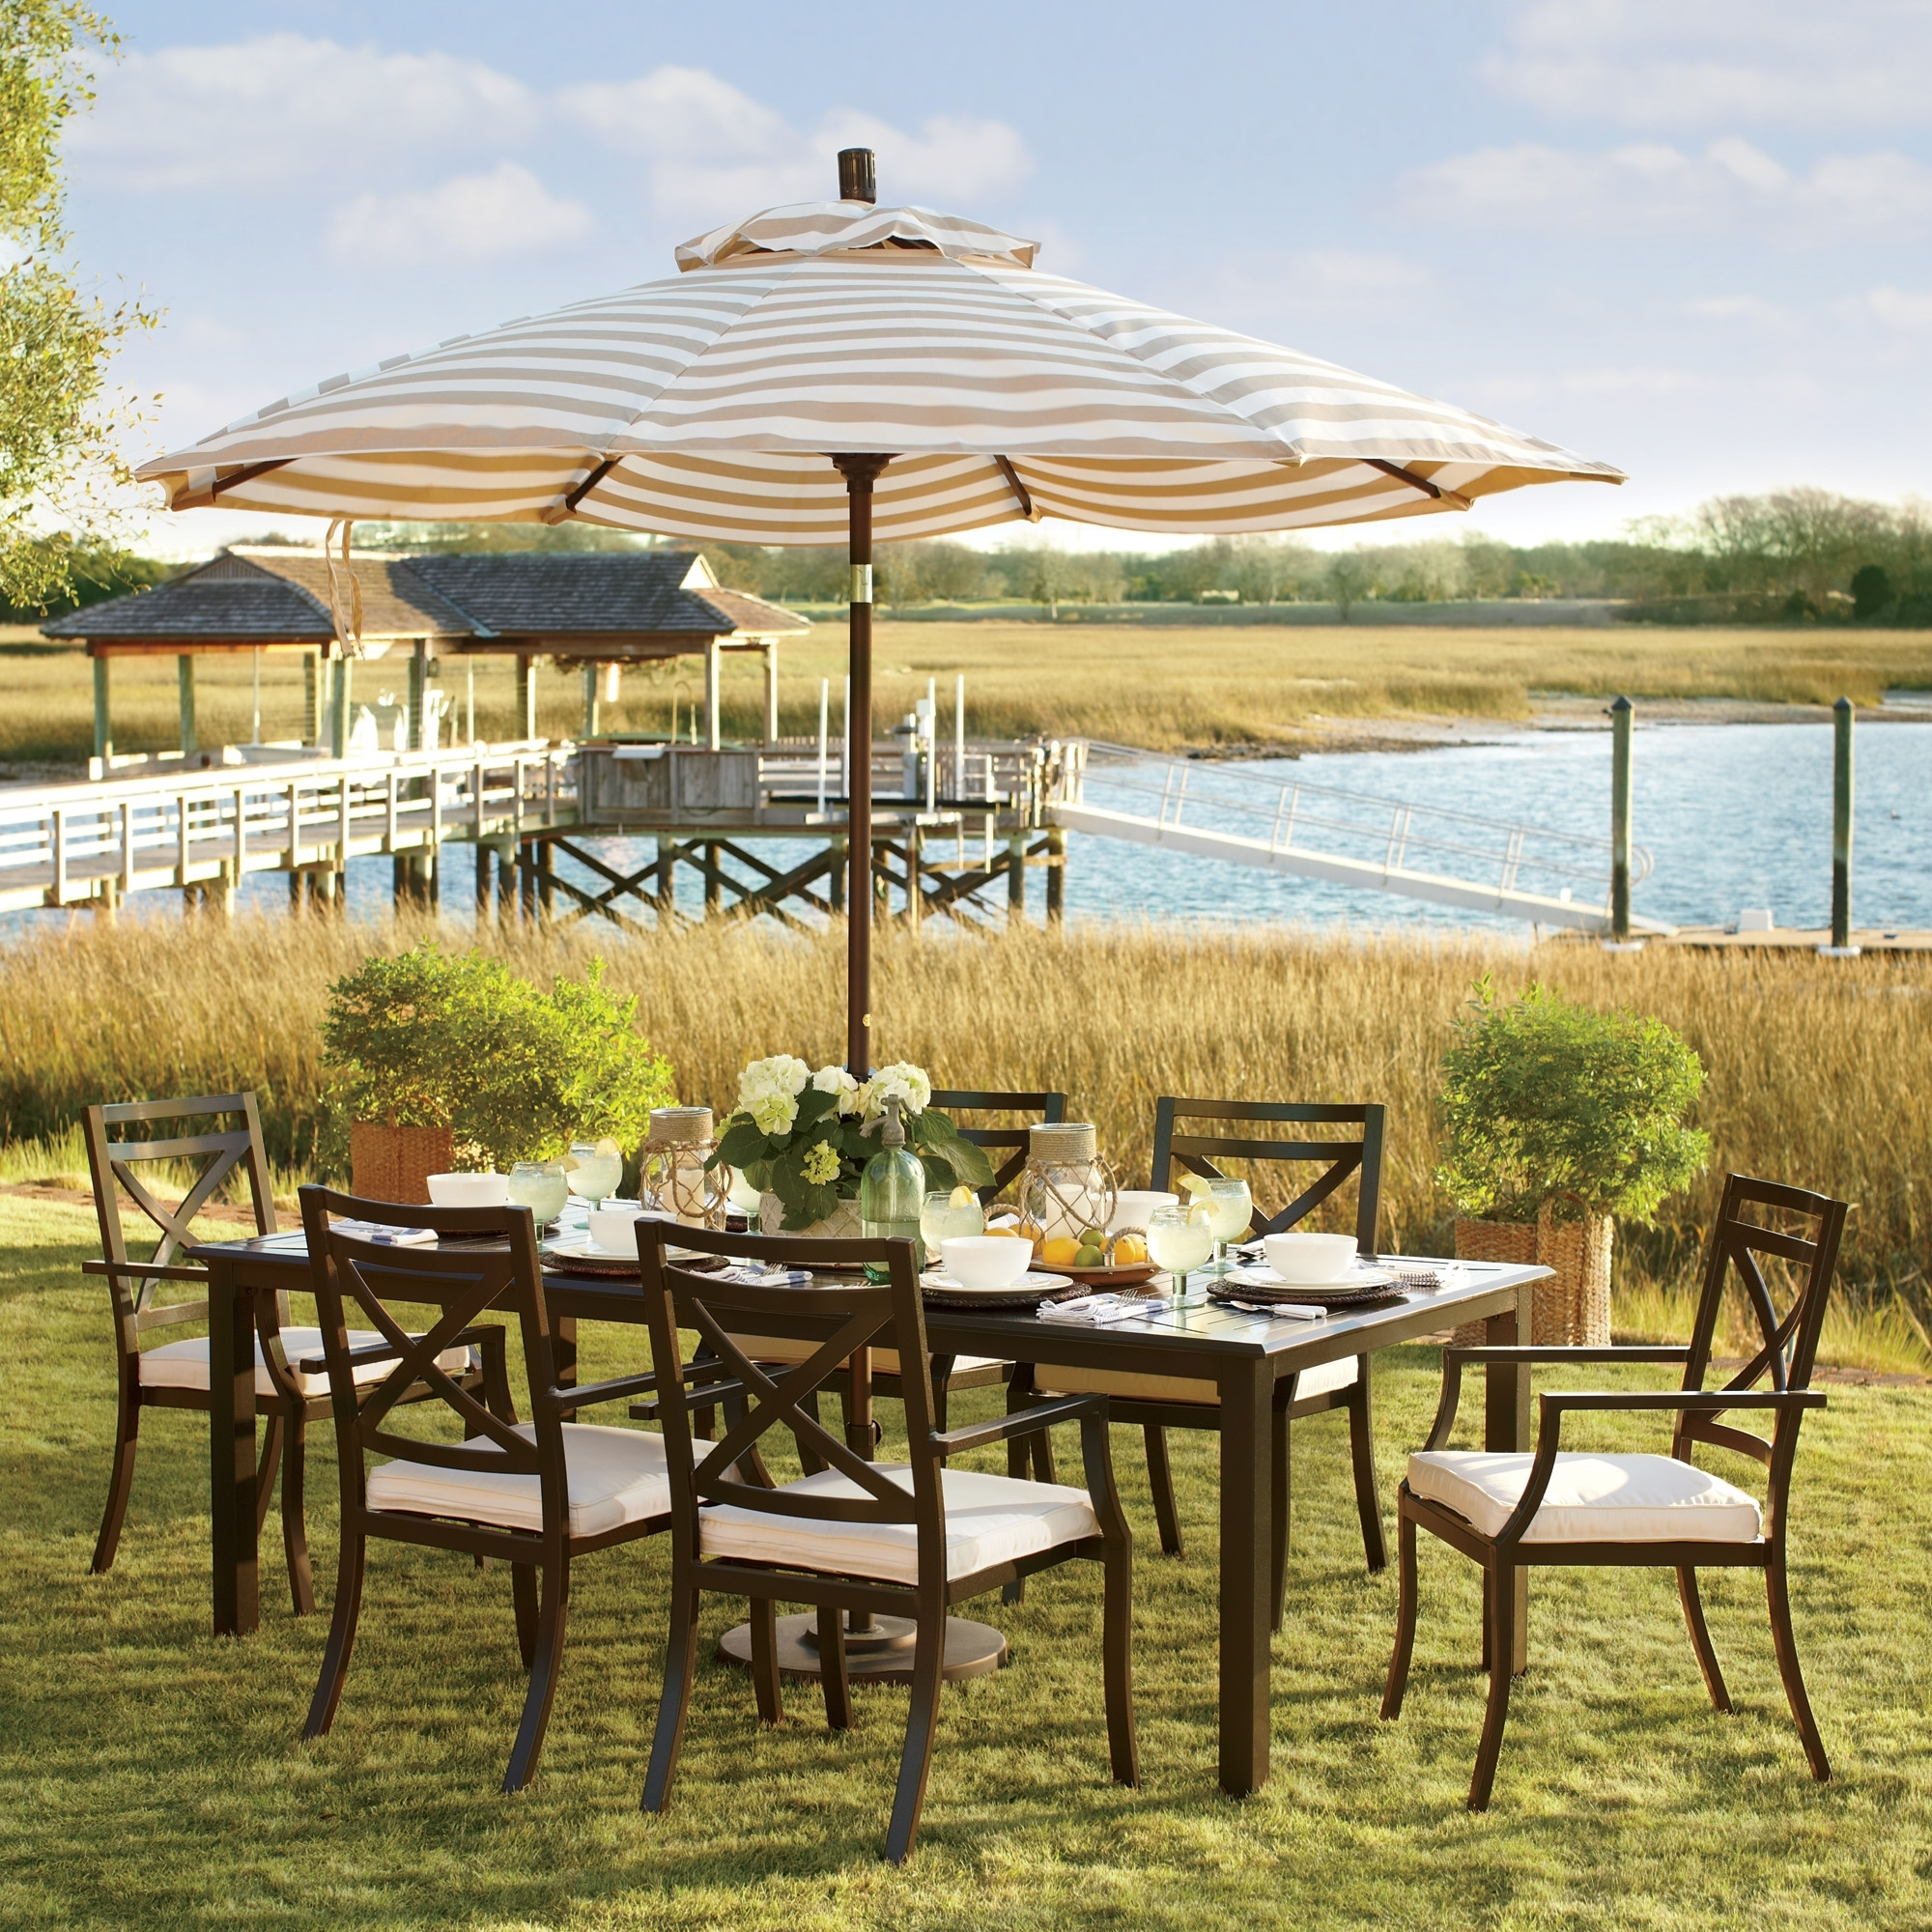 Garden: Enchanting Outdoor Patio Decor Ideas With Patio Umbrellas Throughout Most Popular Cheap Patio Umbrellas (Gallery 4 of 20)